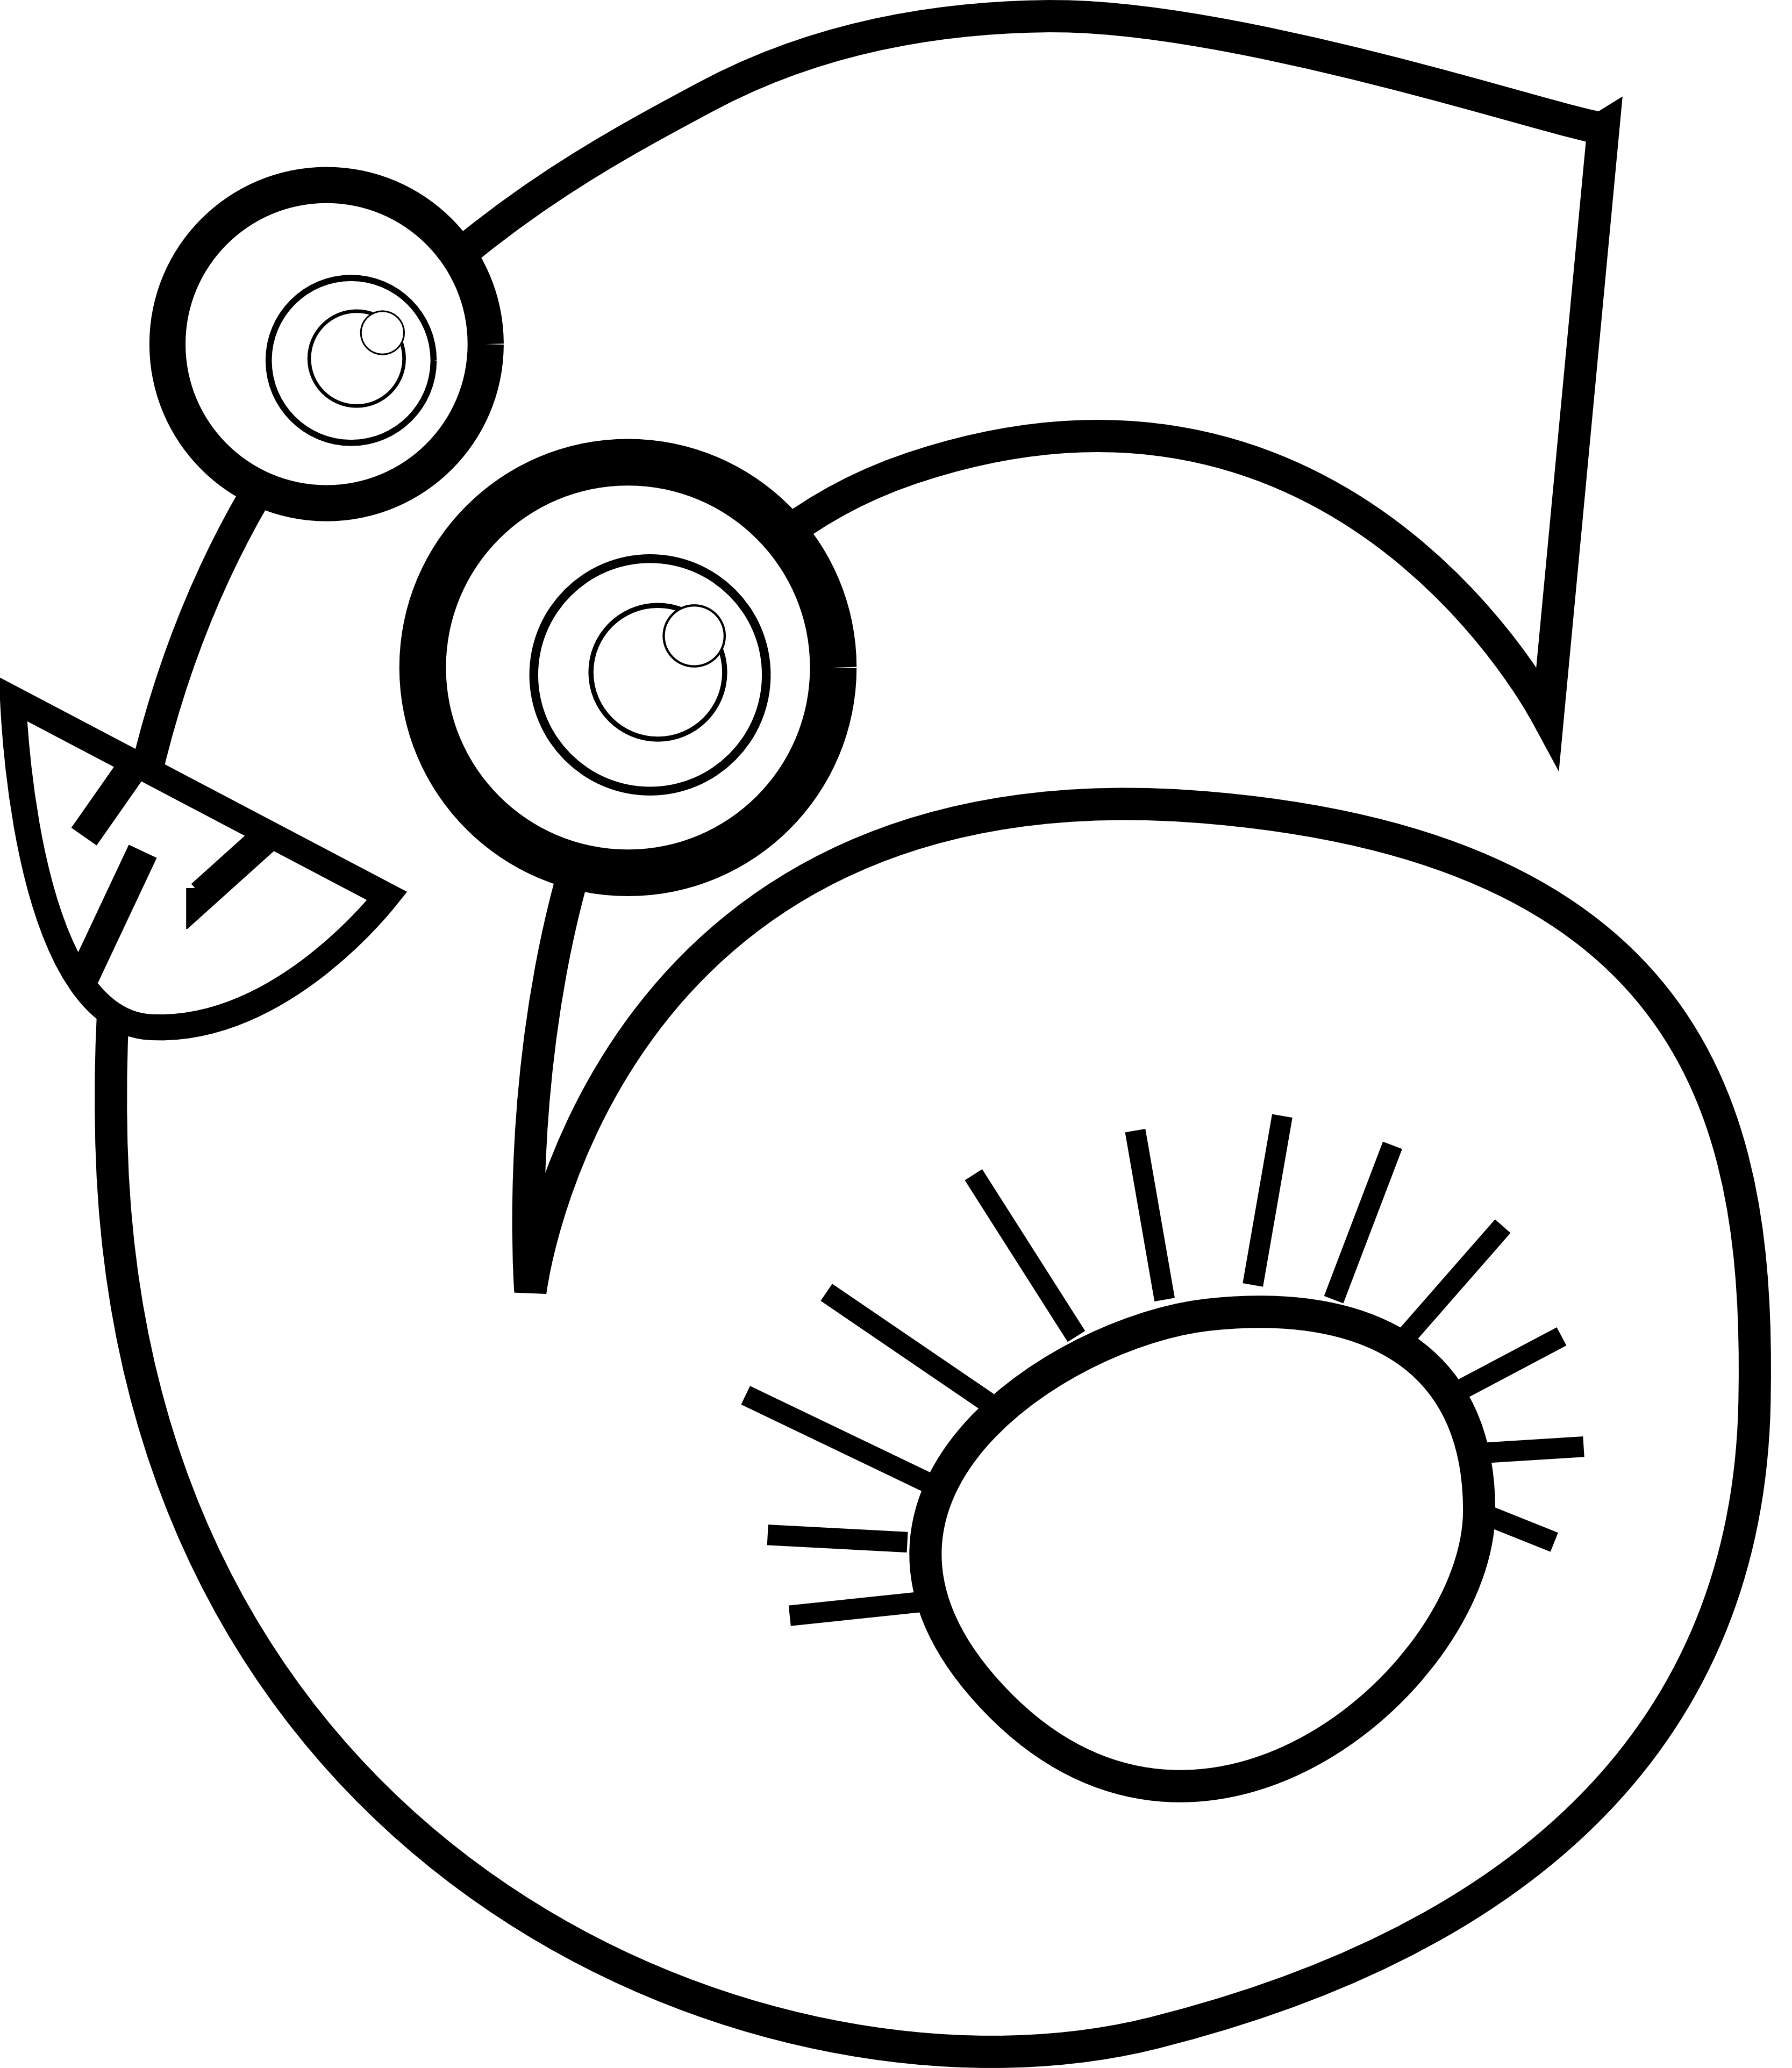 math symbols clipart black | clipart panda - free clipart images